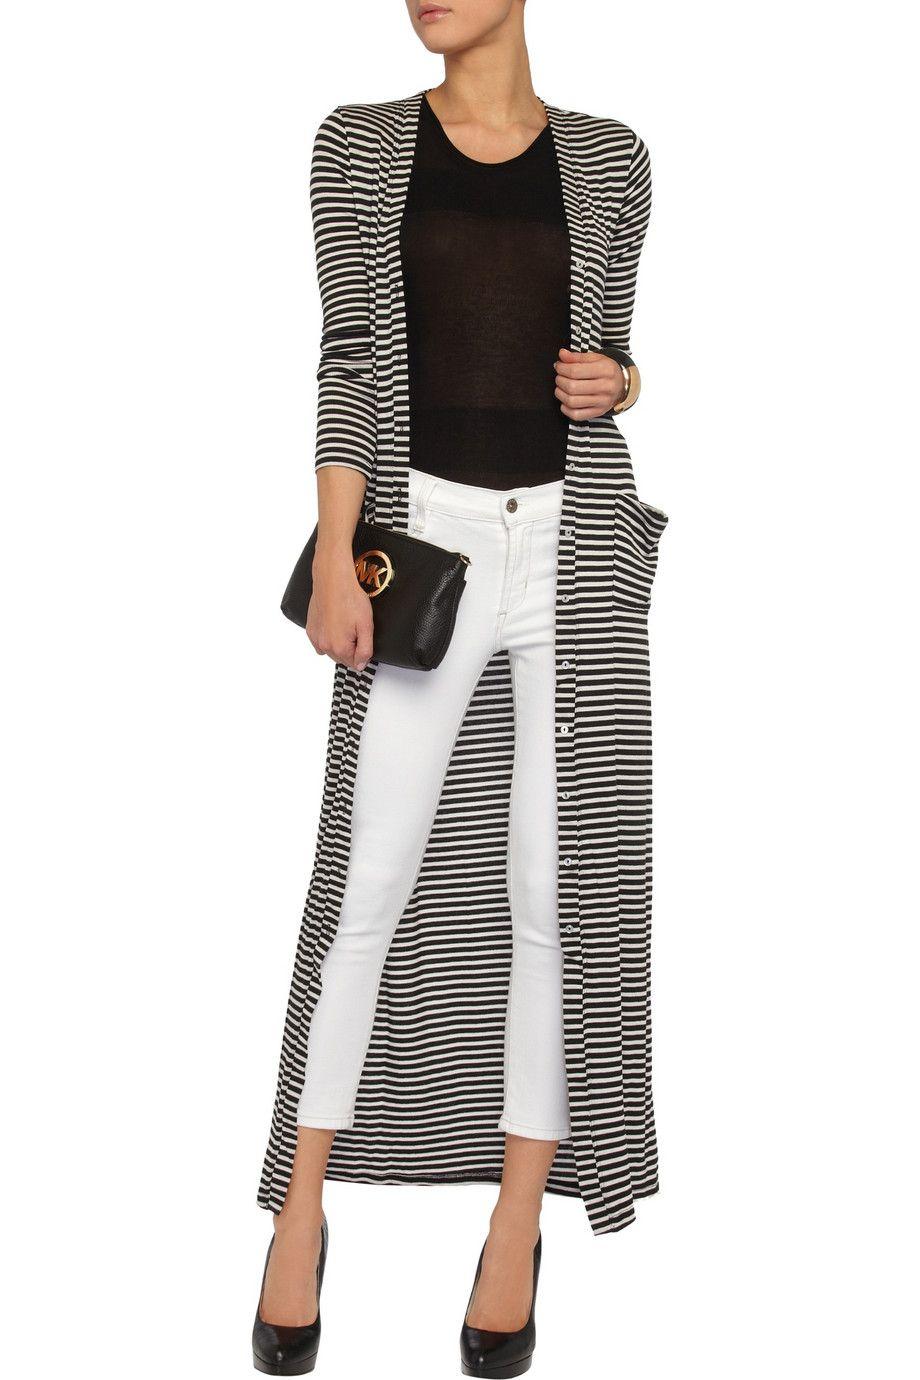 Tart Cleo striped ribbed-jersey maxi cardigan | Closet fashion ...